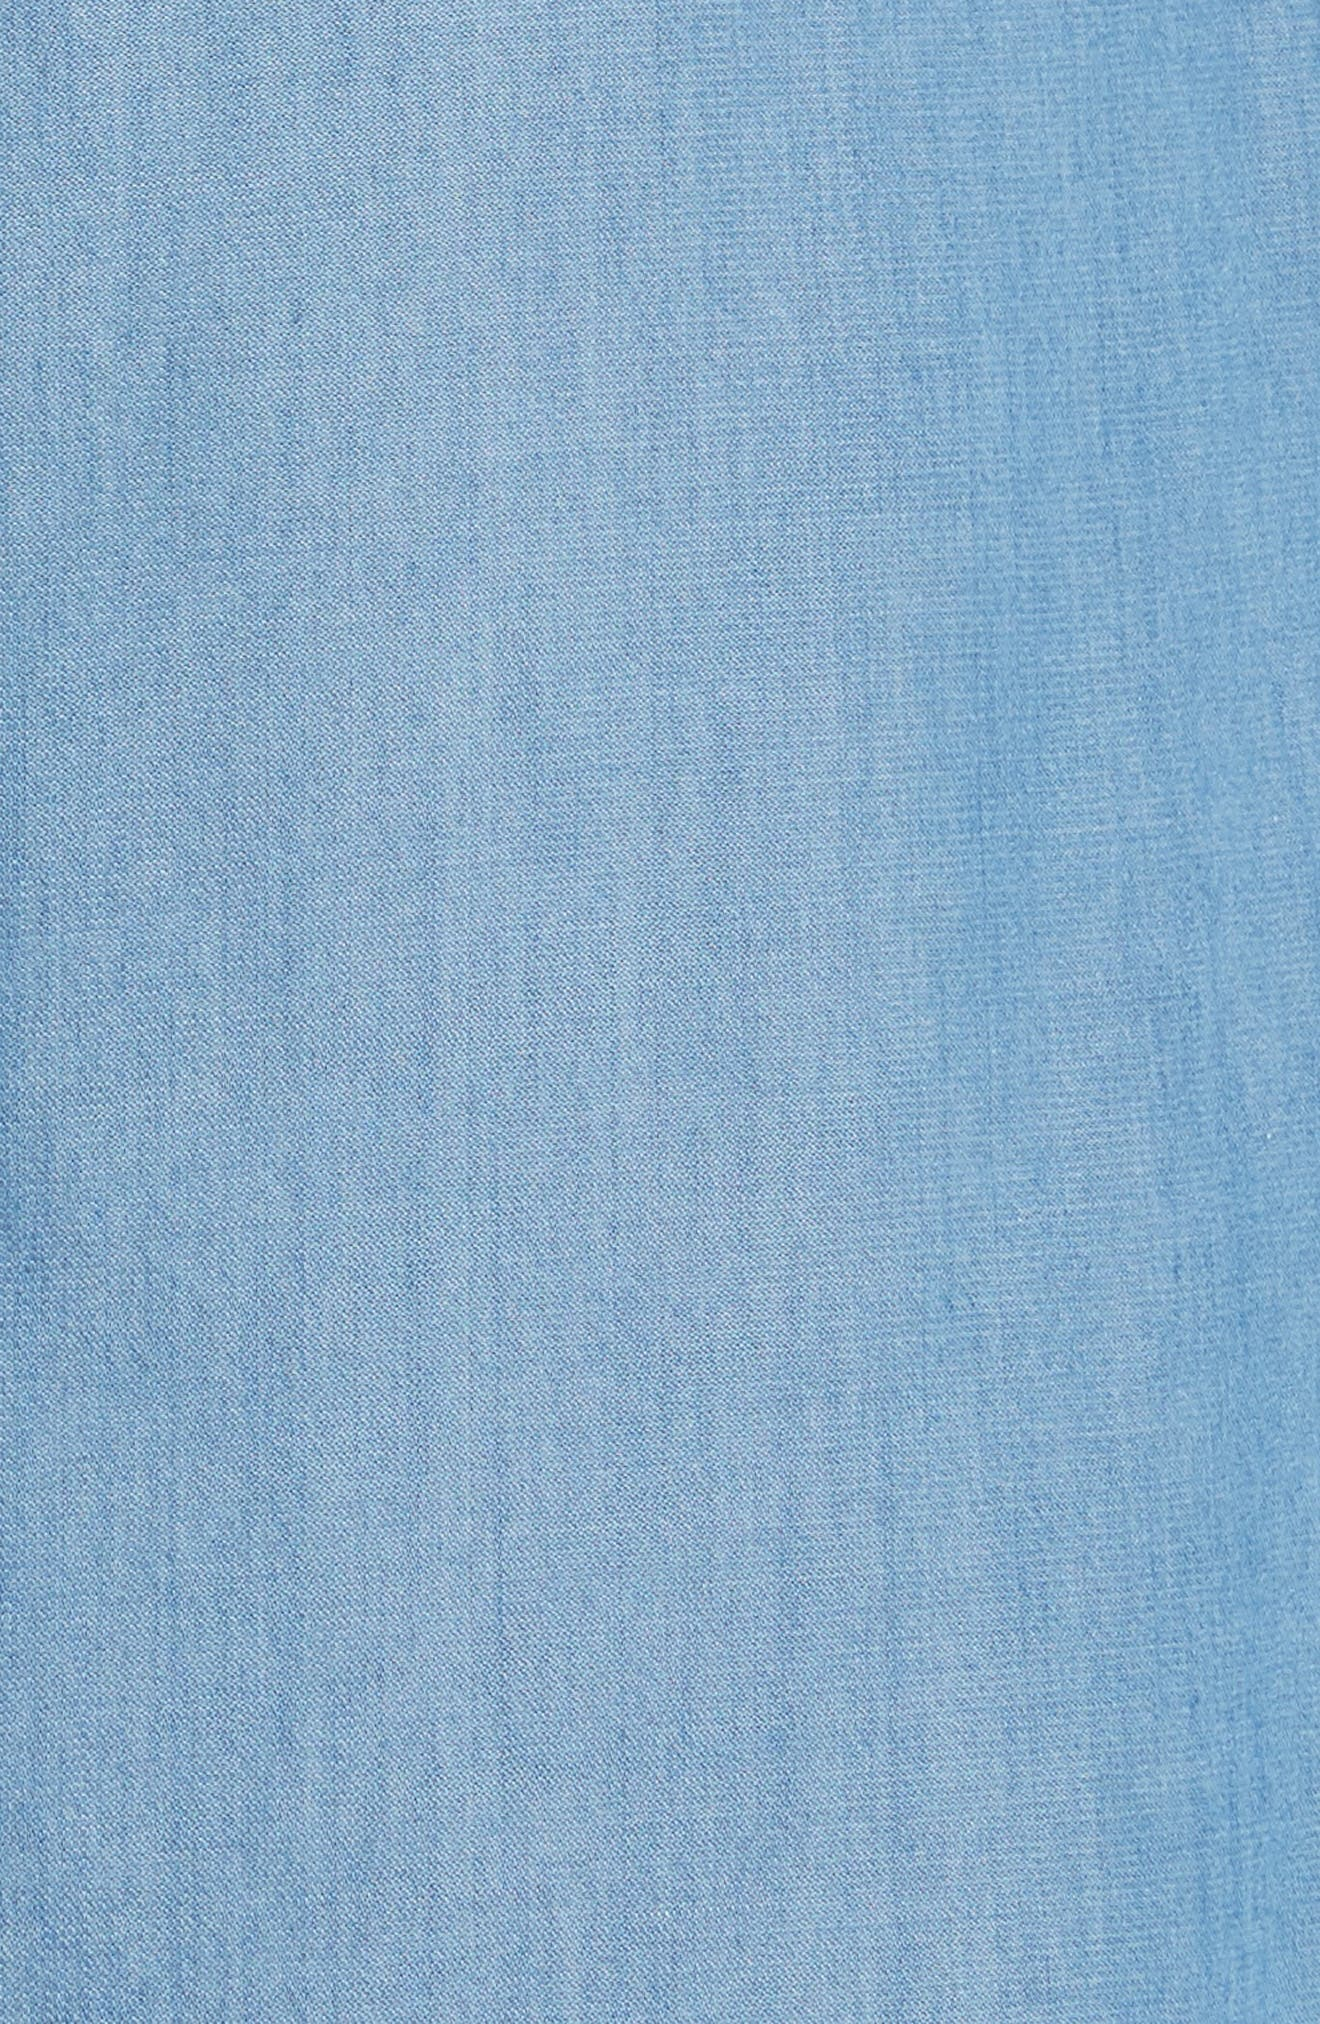 Cotton & Cashmere Chambray Shirtdress,                             Alternate thumbnail 5, color,                             400